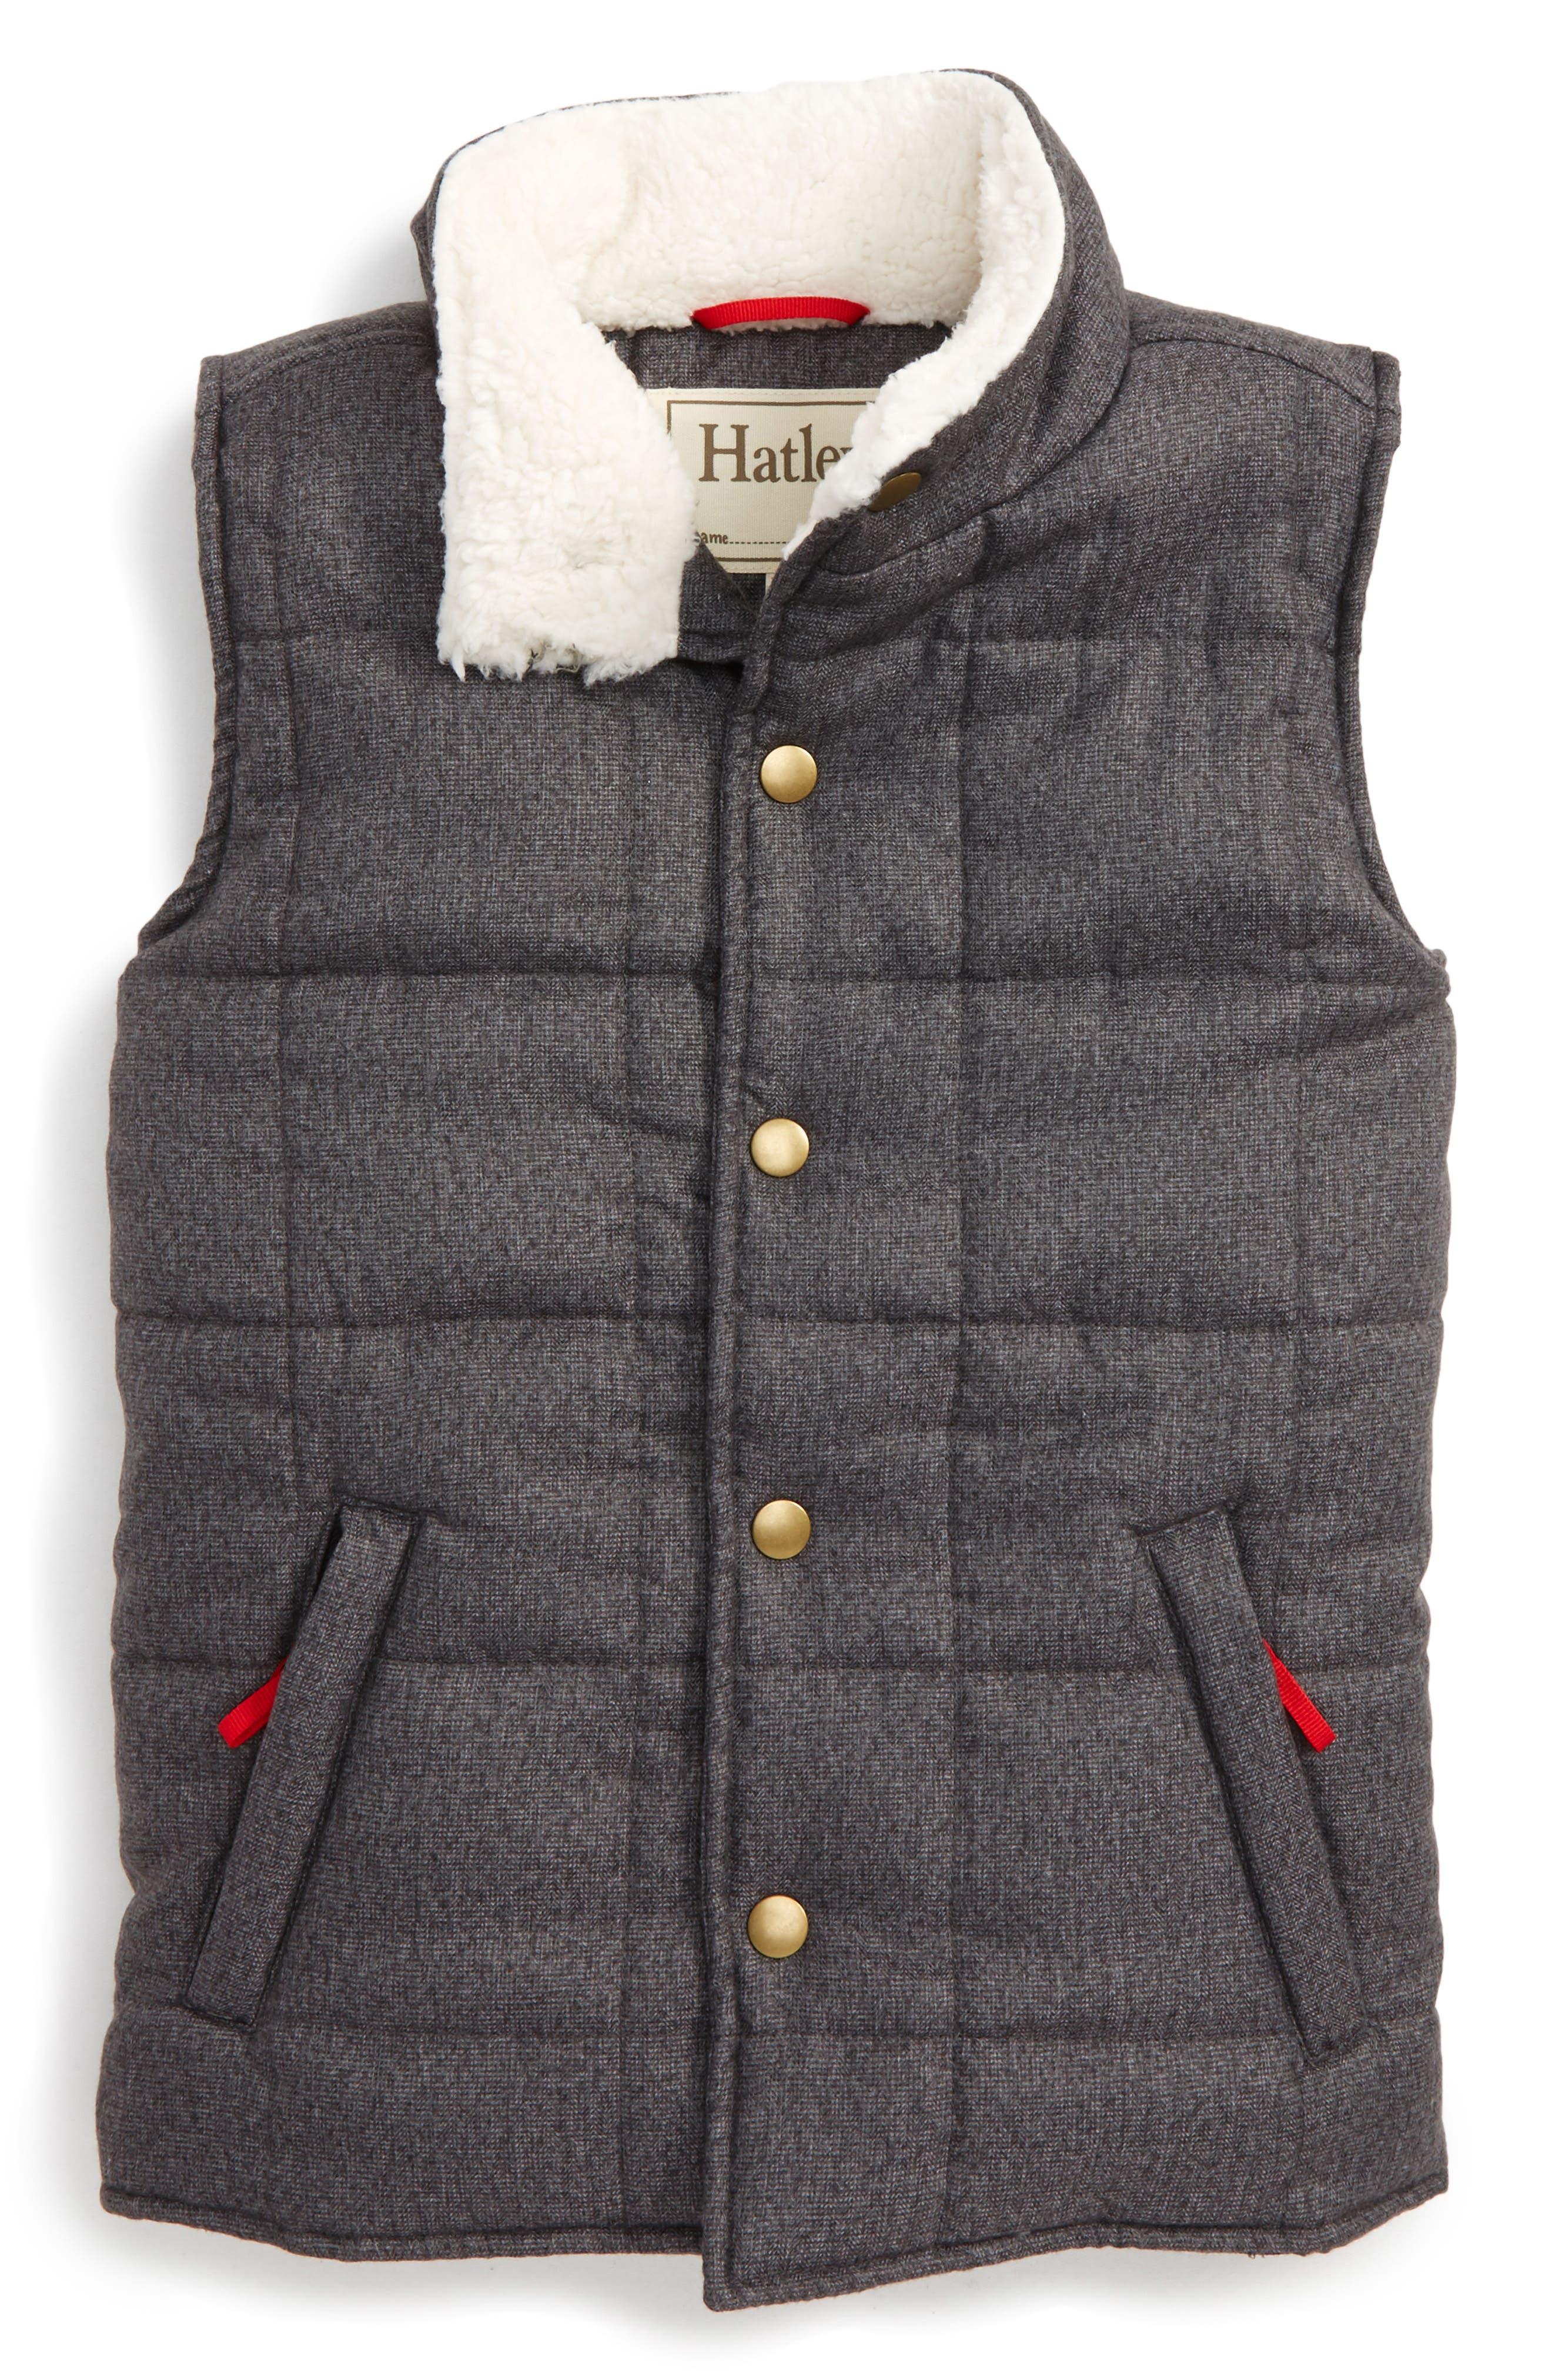 Hatley Quilted Vest (Toddler Boys, Little Boys & Big Boys)